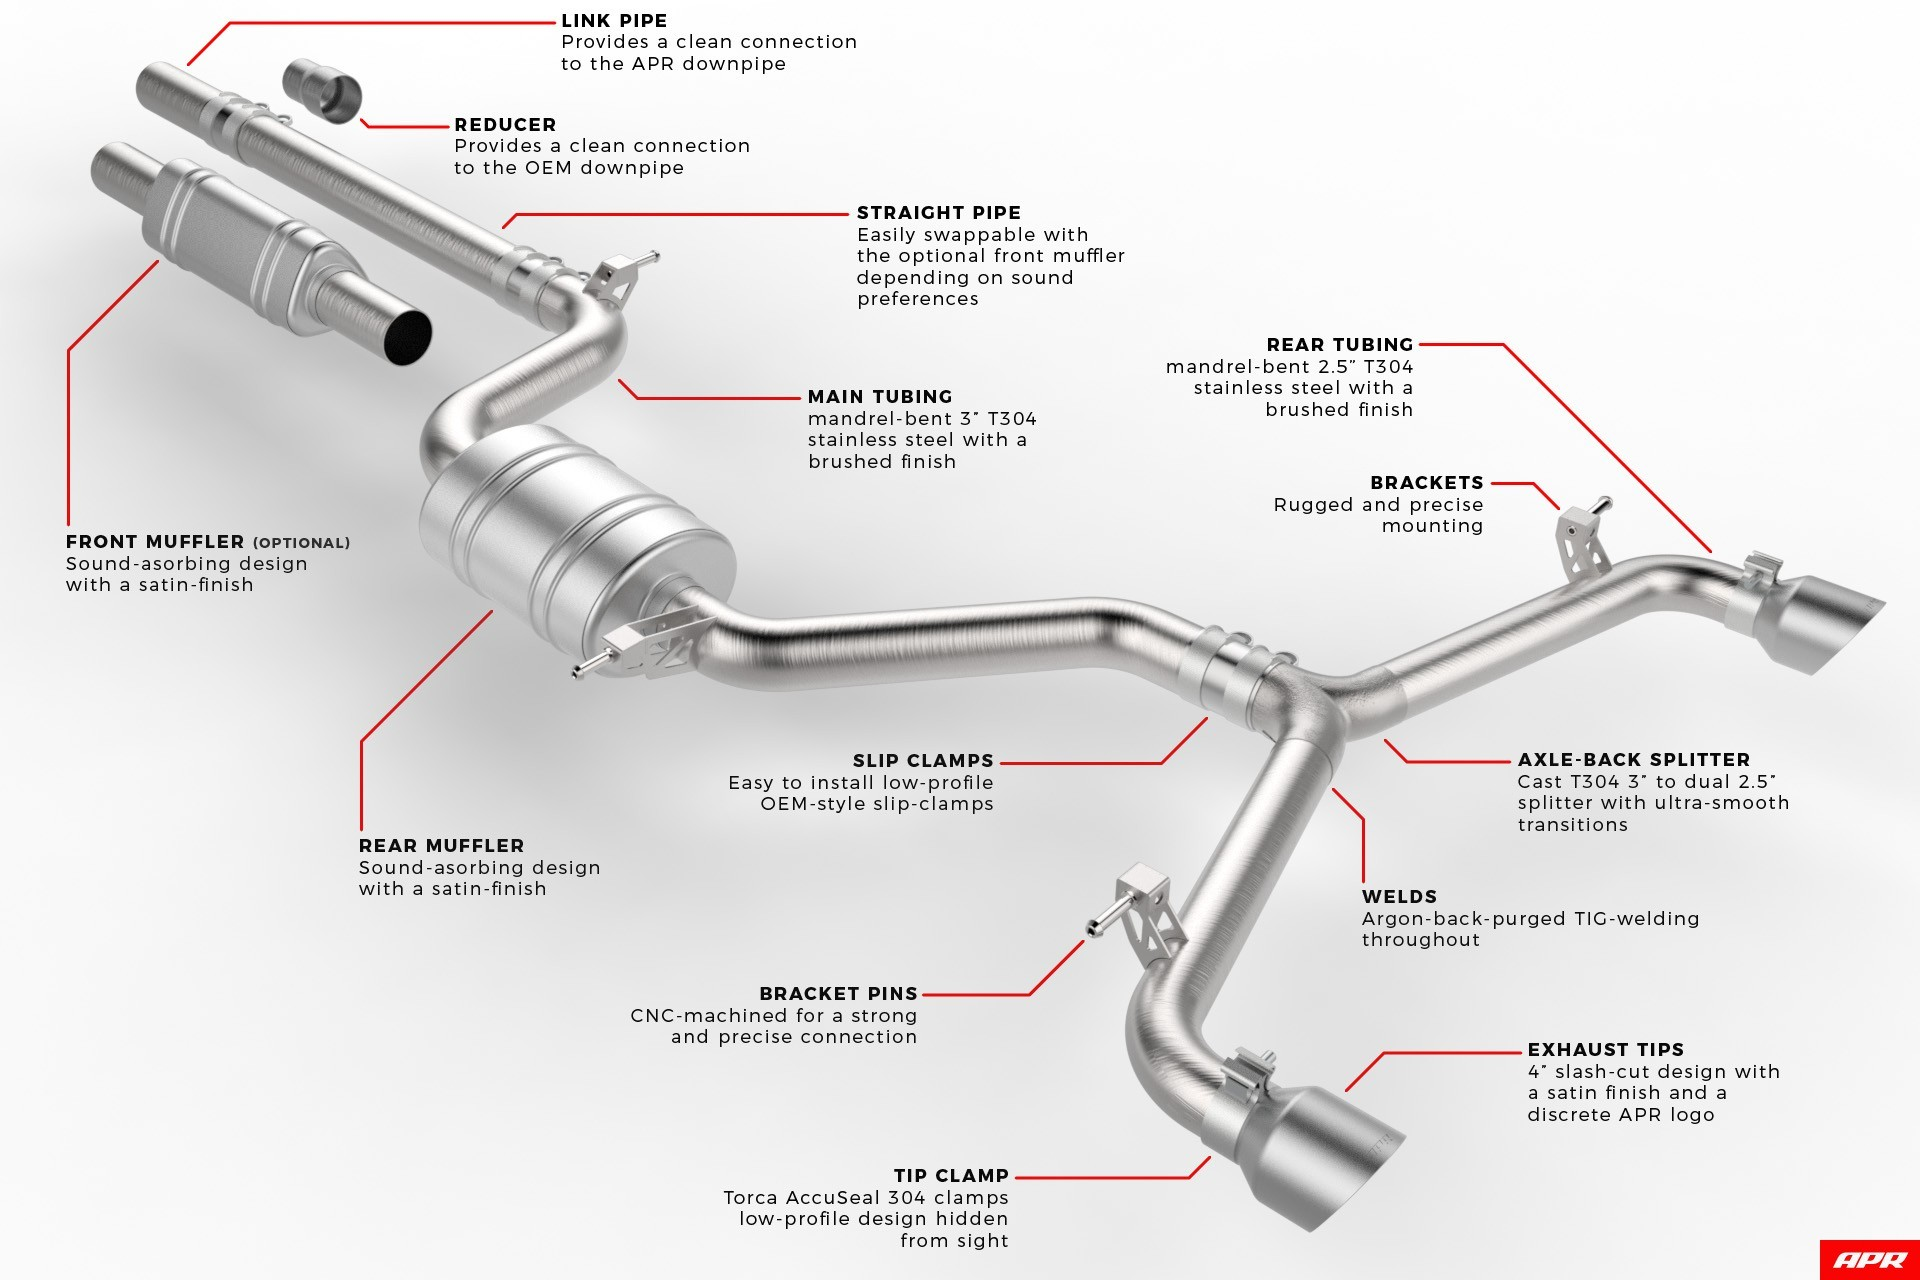 Car Exhaust System Diagram Apr Mk7 Gti Turboback Exhaust System W Usp Downpipe Cbk0001 Usp